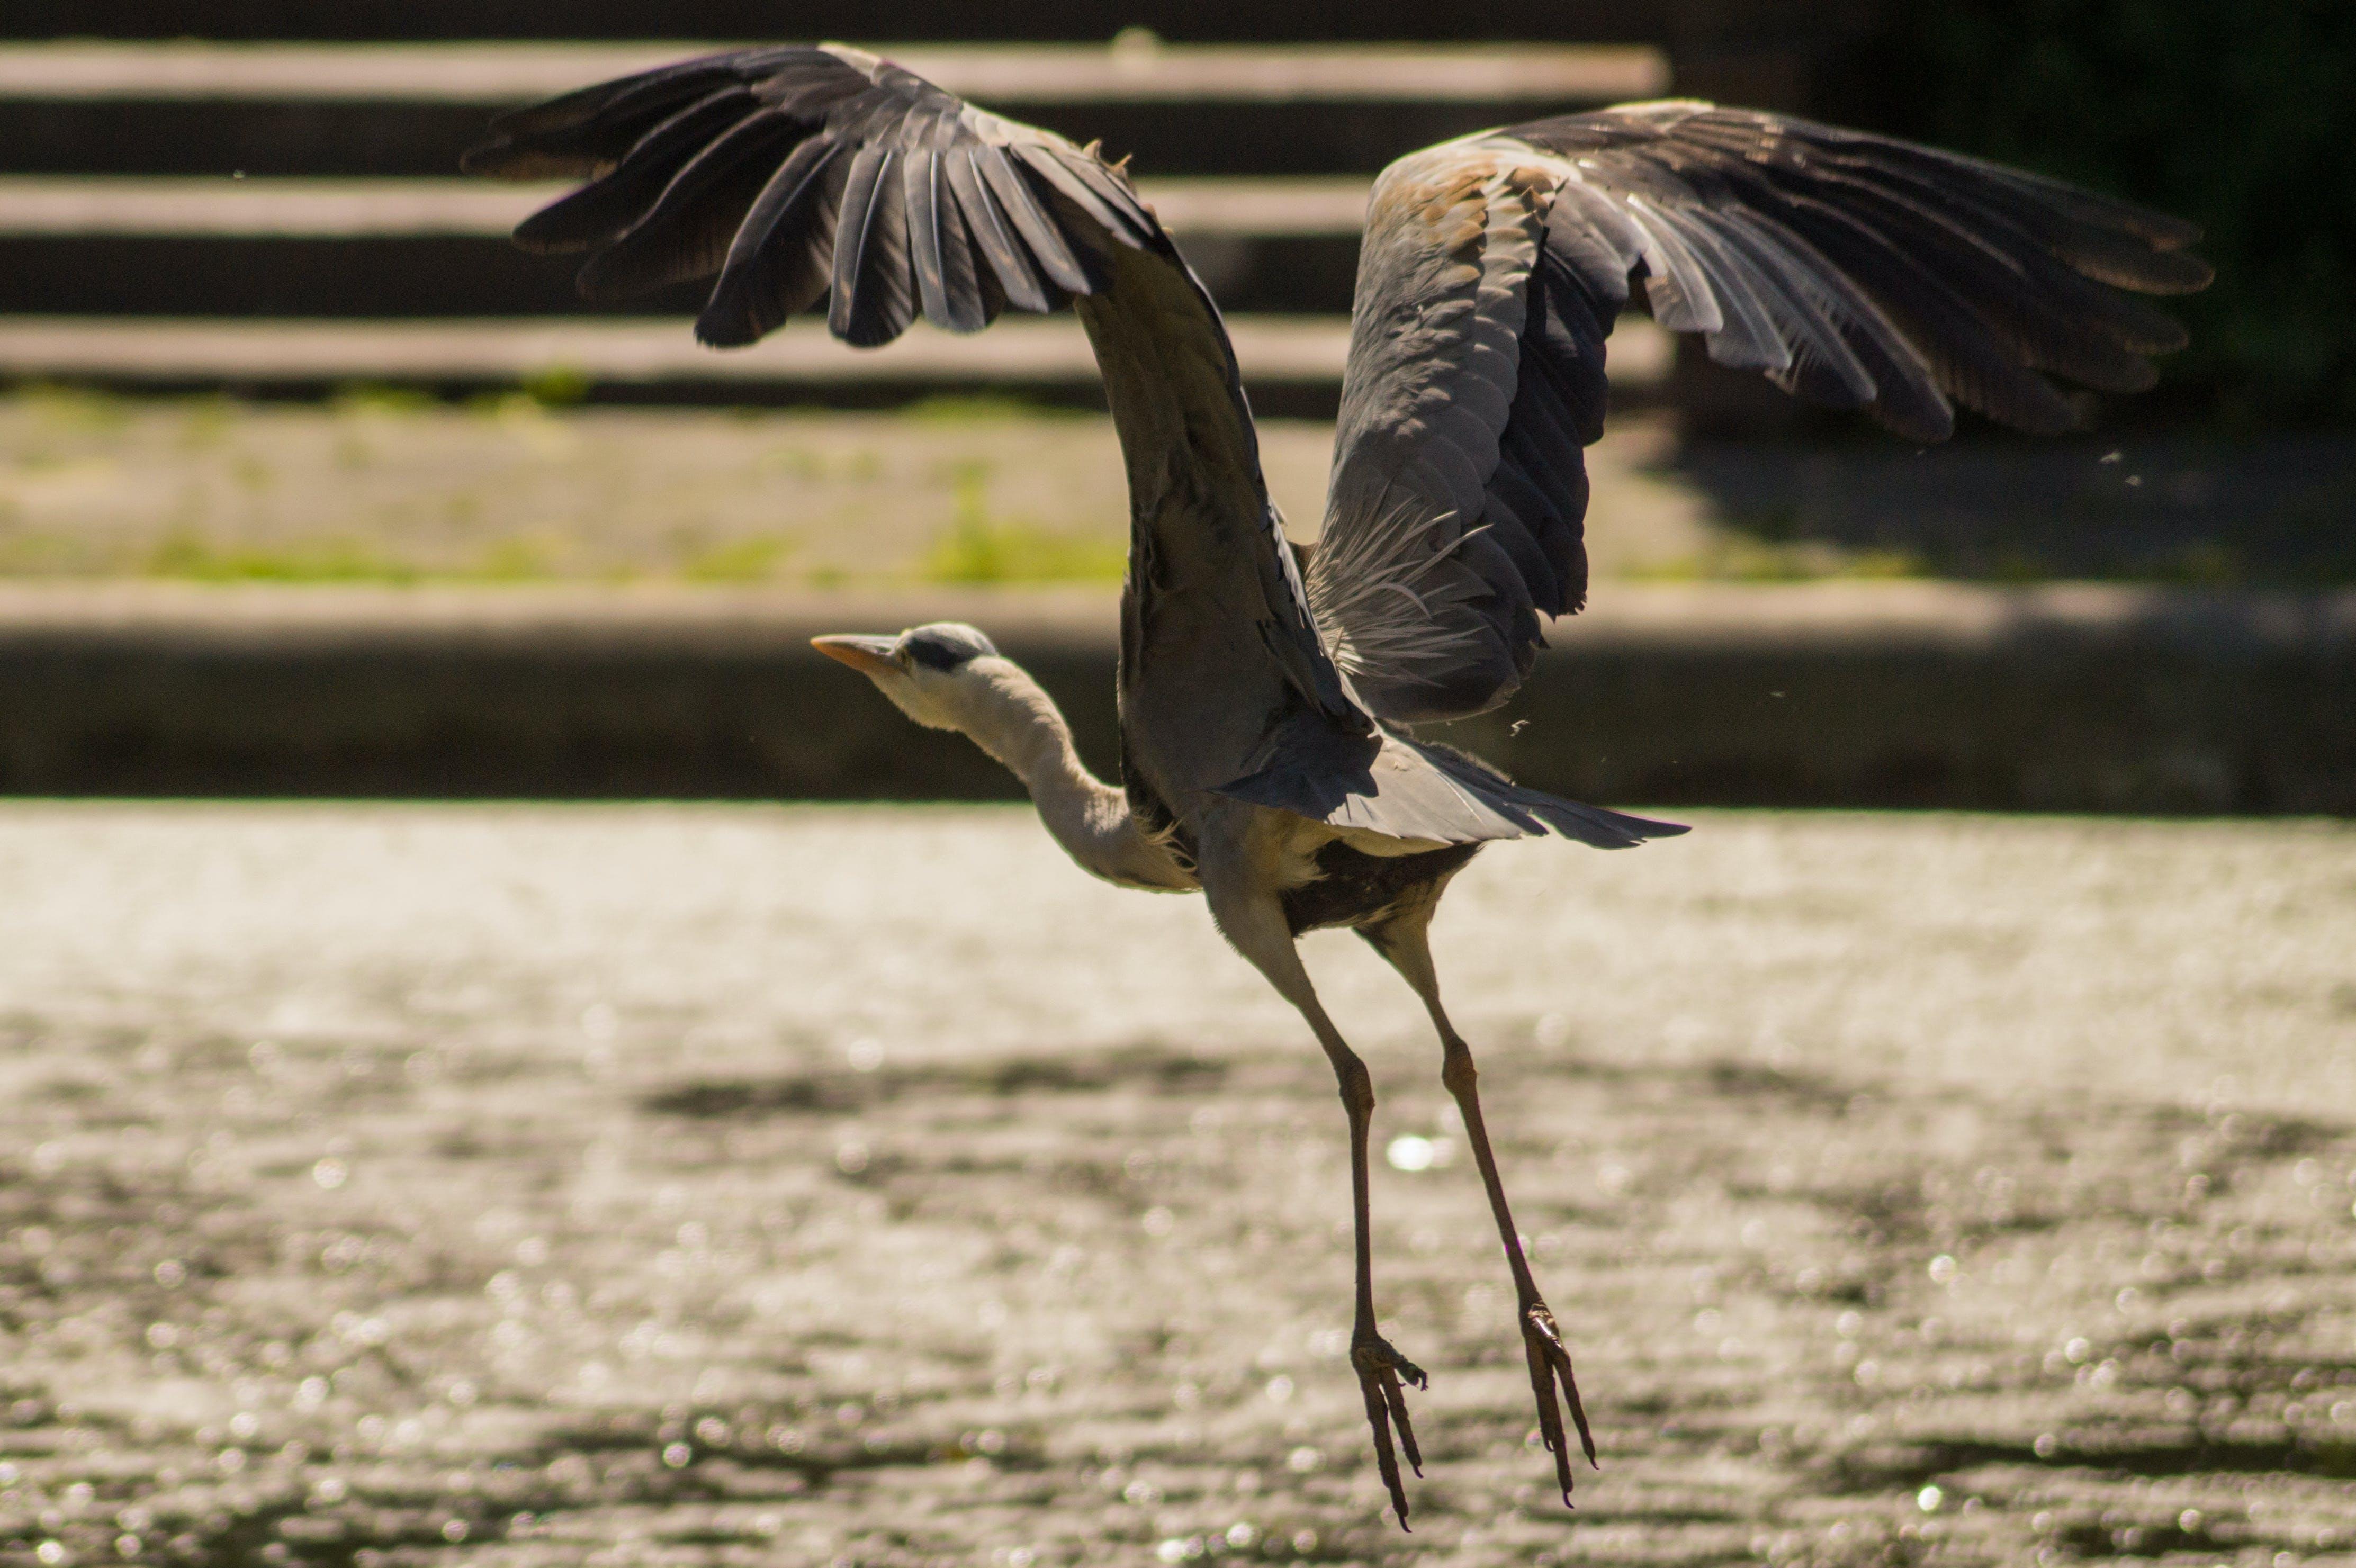 Closeup Photo of Black and Gray Bird